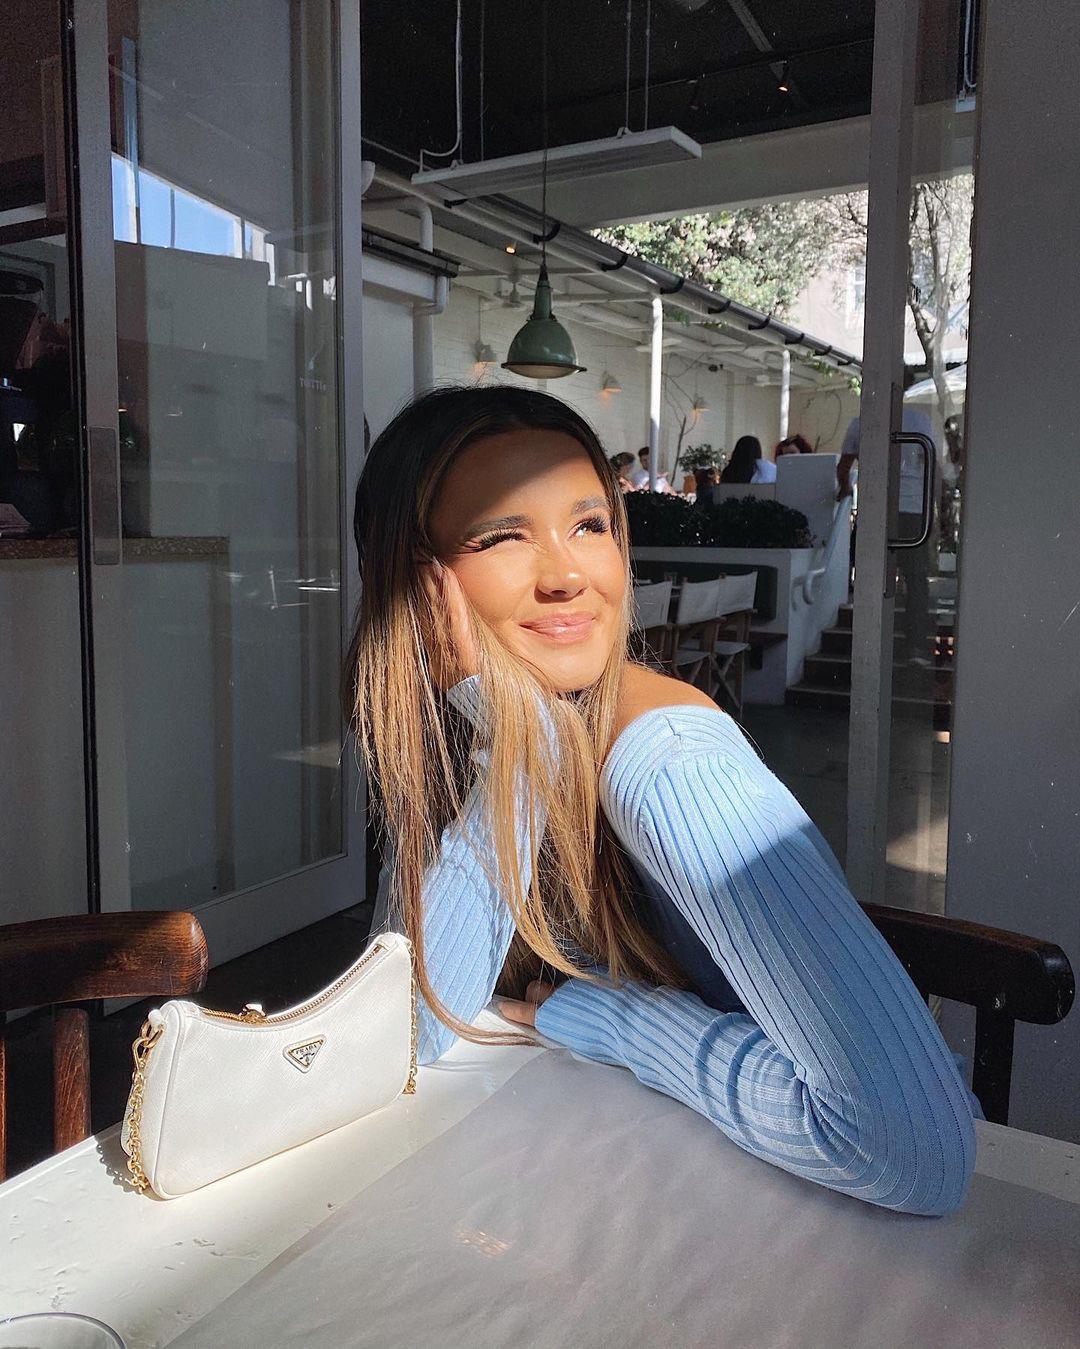 Isabelle-Clarke-Wallpapers-Insta-Fit-Bio-11